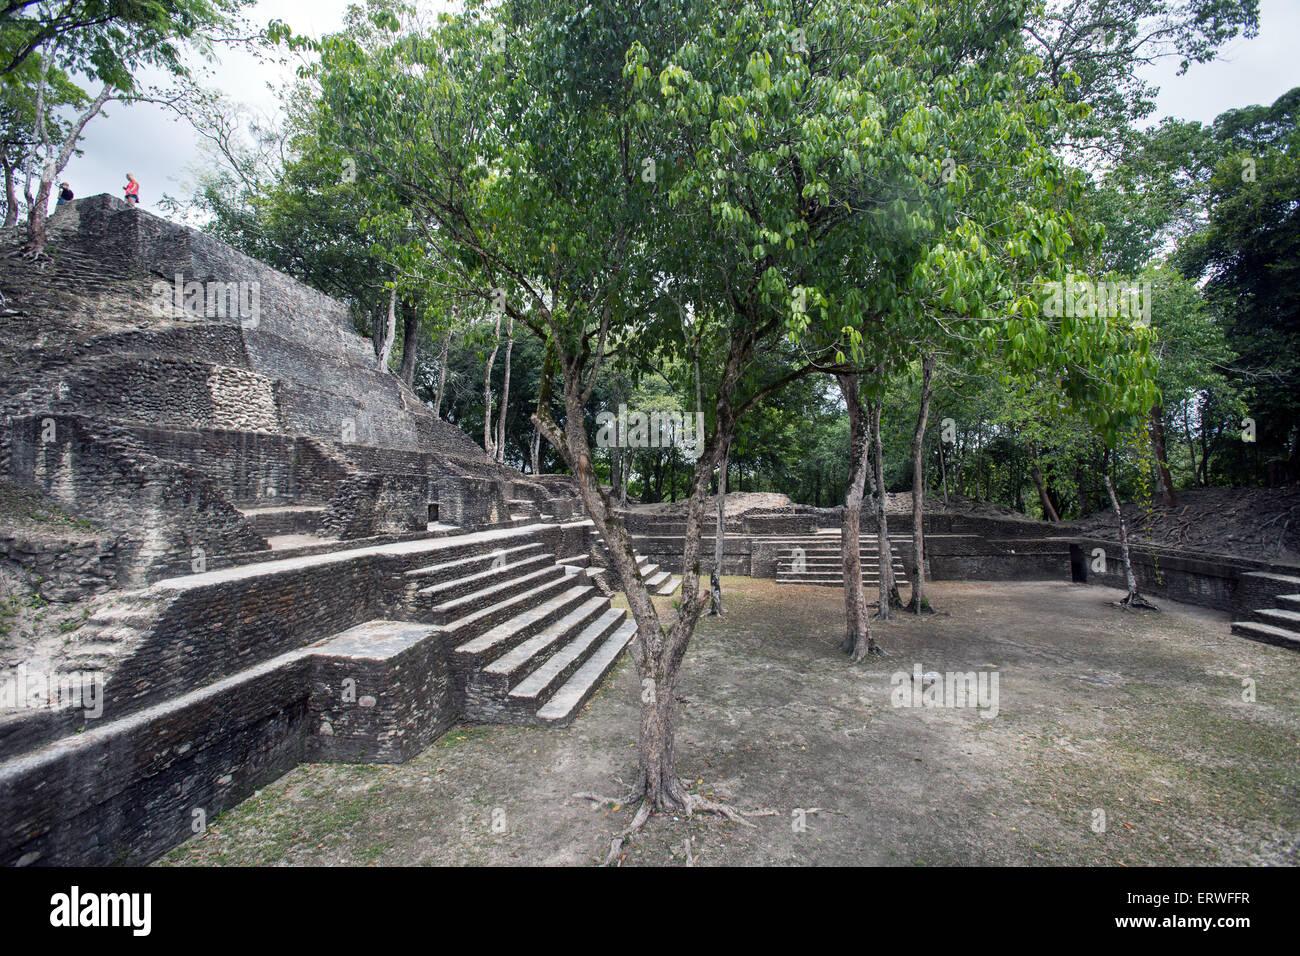 Cahal Pech Mayan ruins in the town of San Ignacio, Belize. - Stock Image